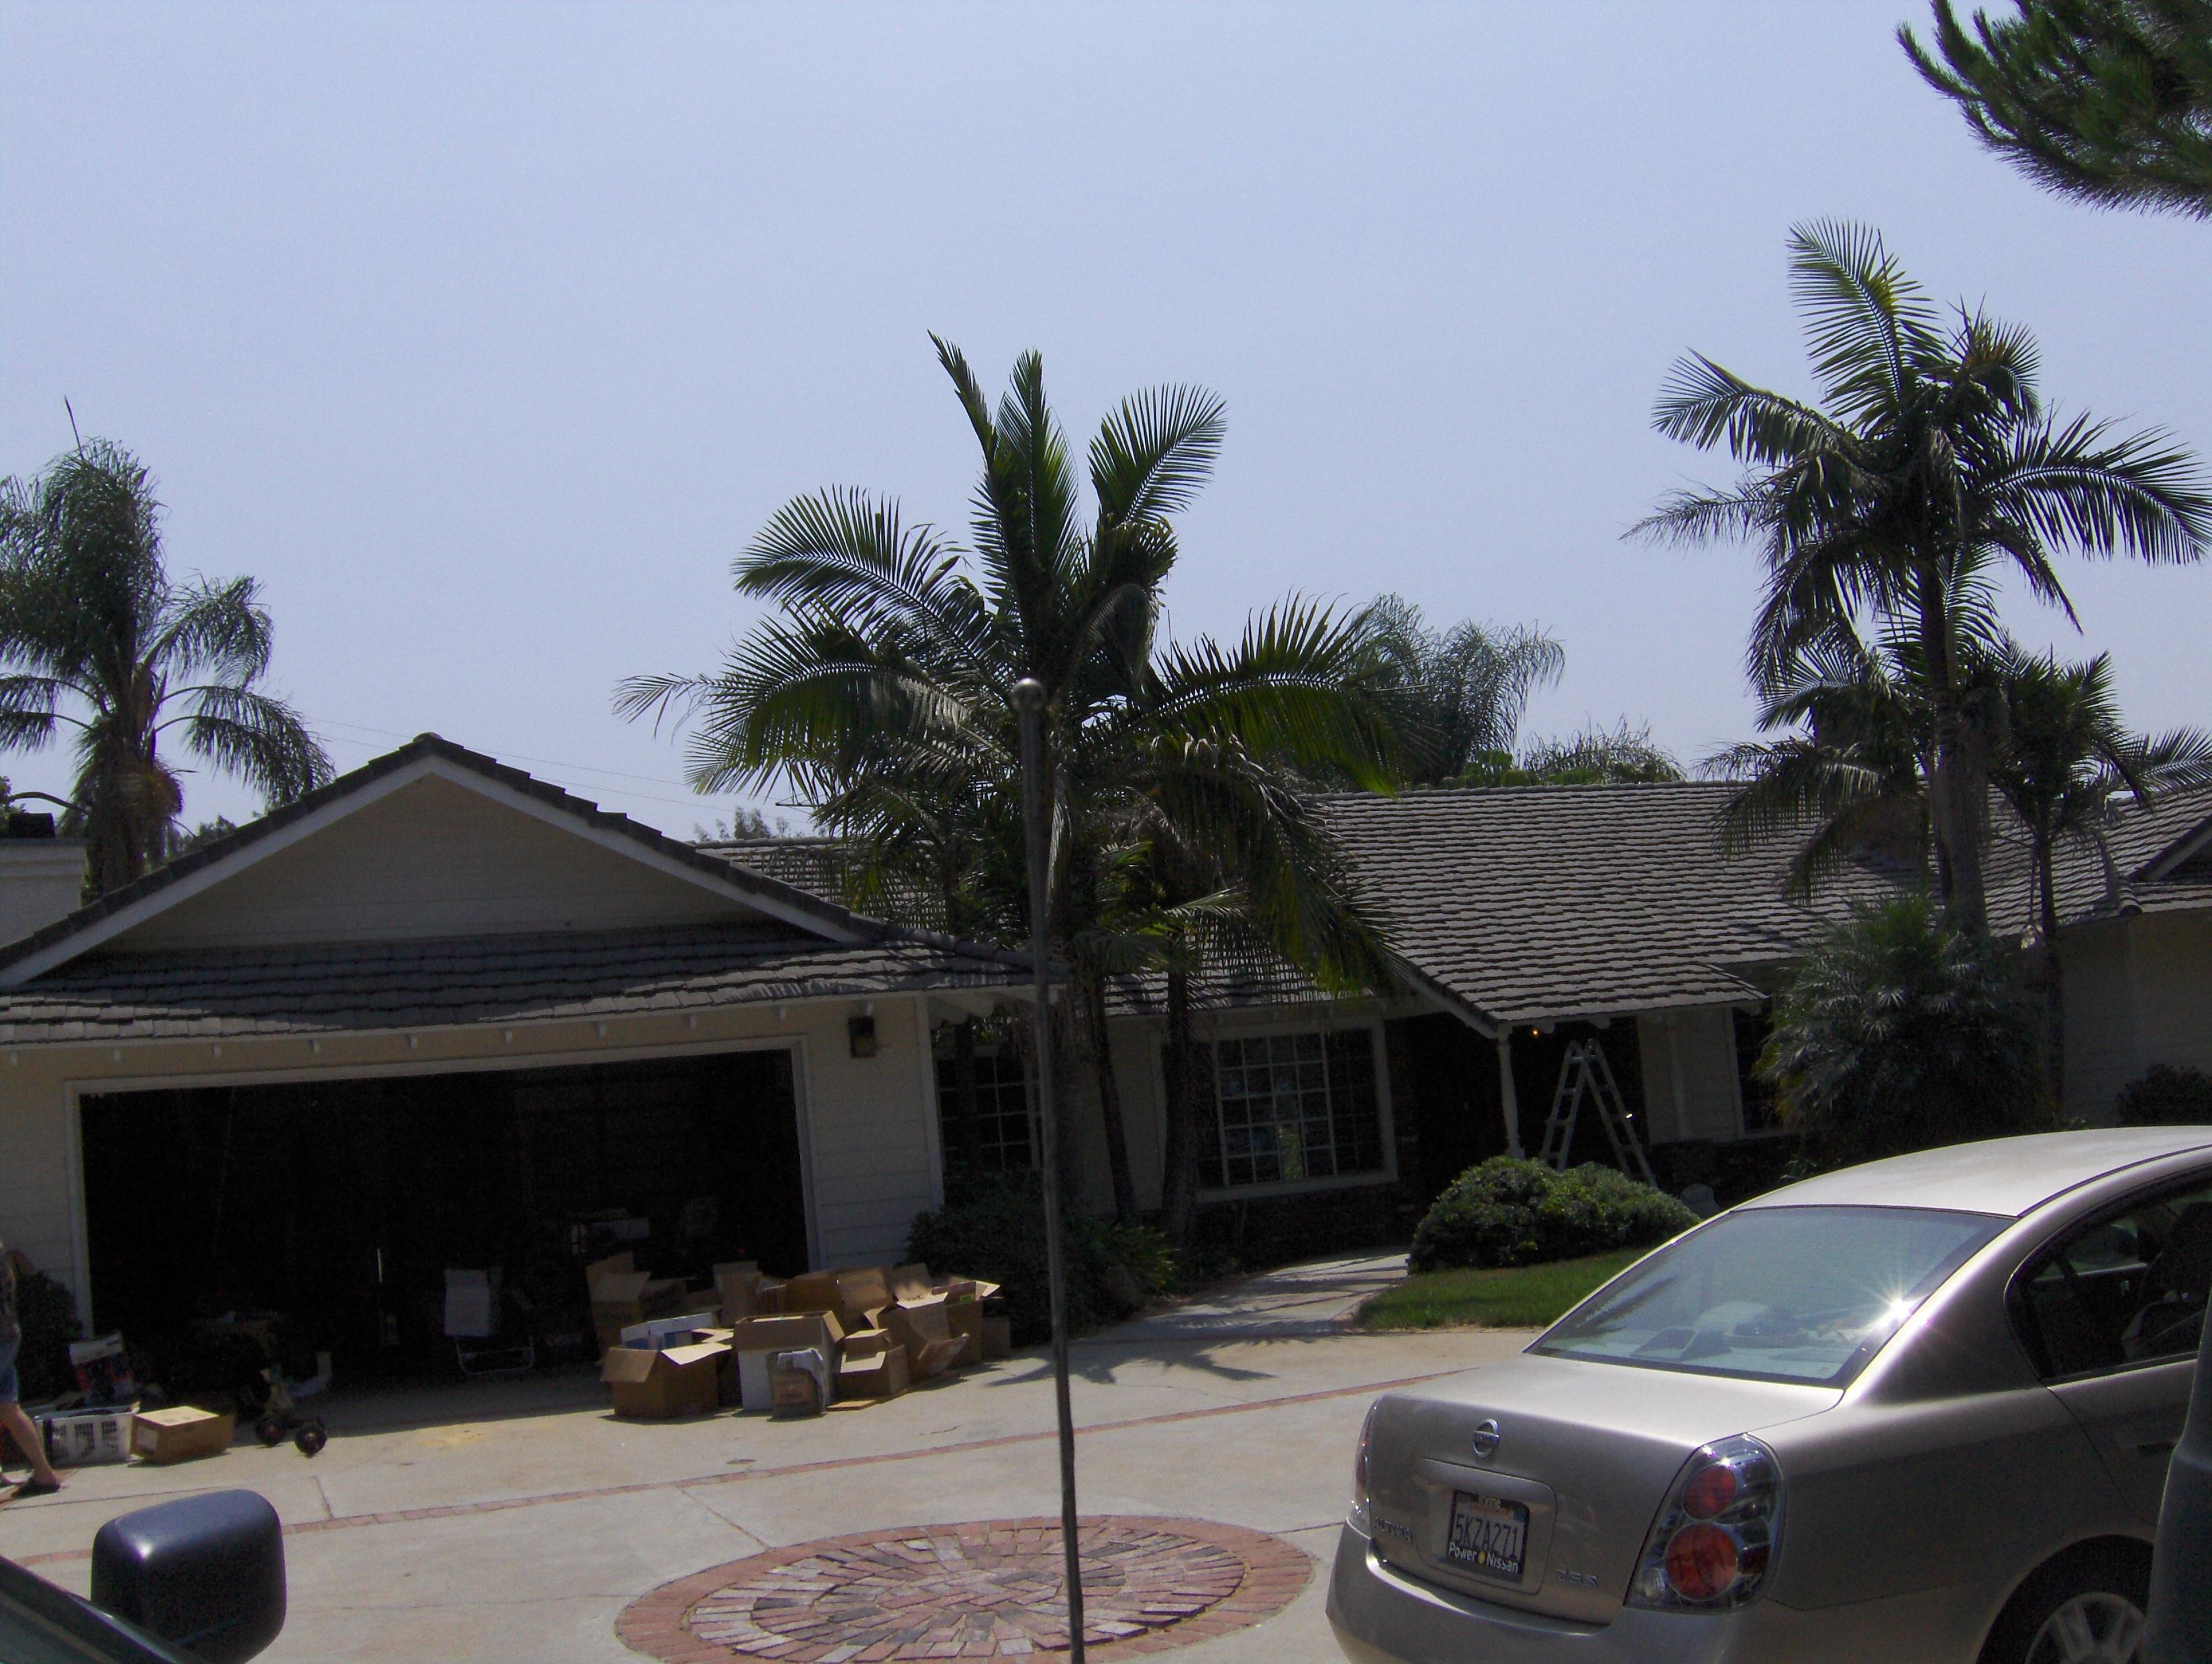 2009-08-2133-1P.JPG